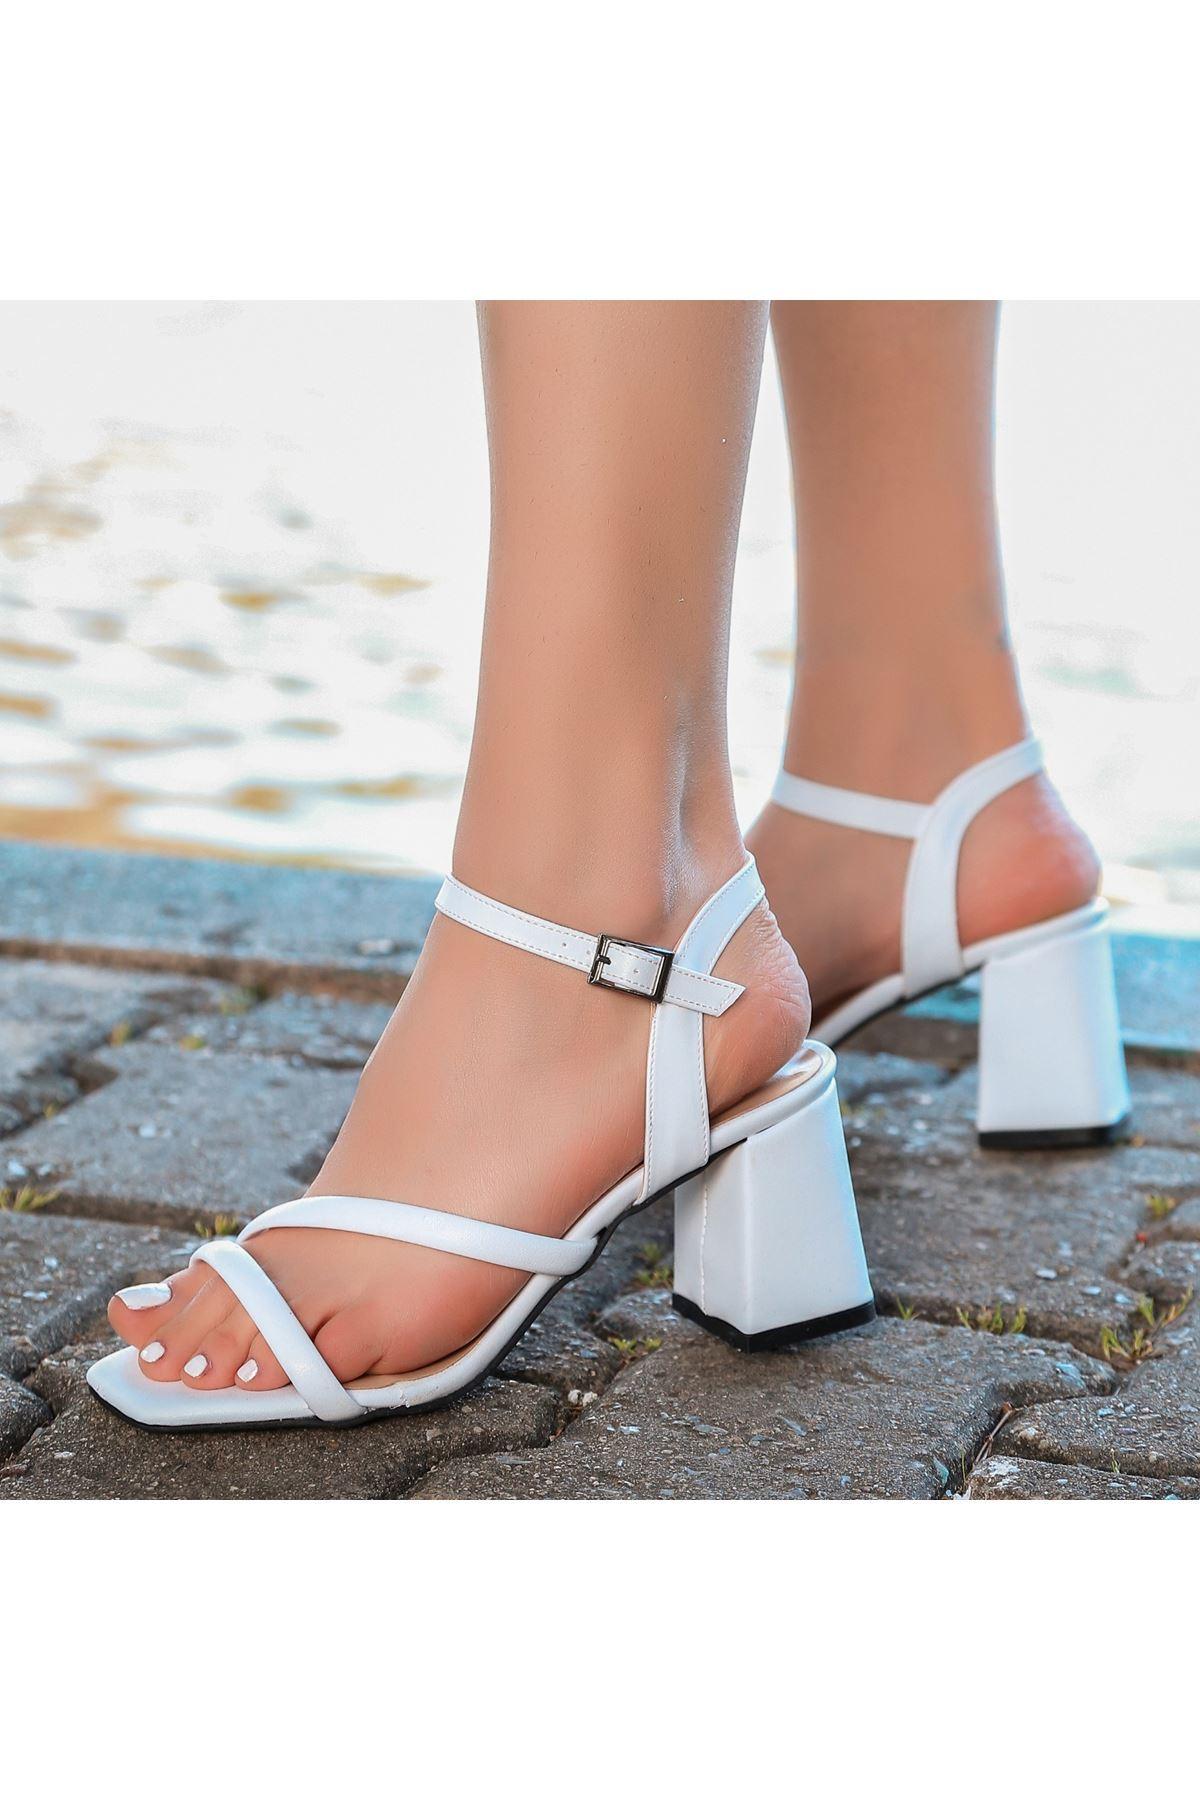 Lior Beyaz Cilt Topuklu Ayakkabı